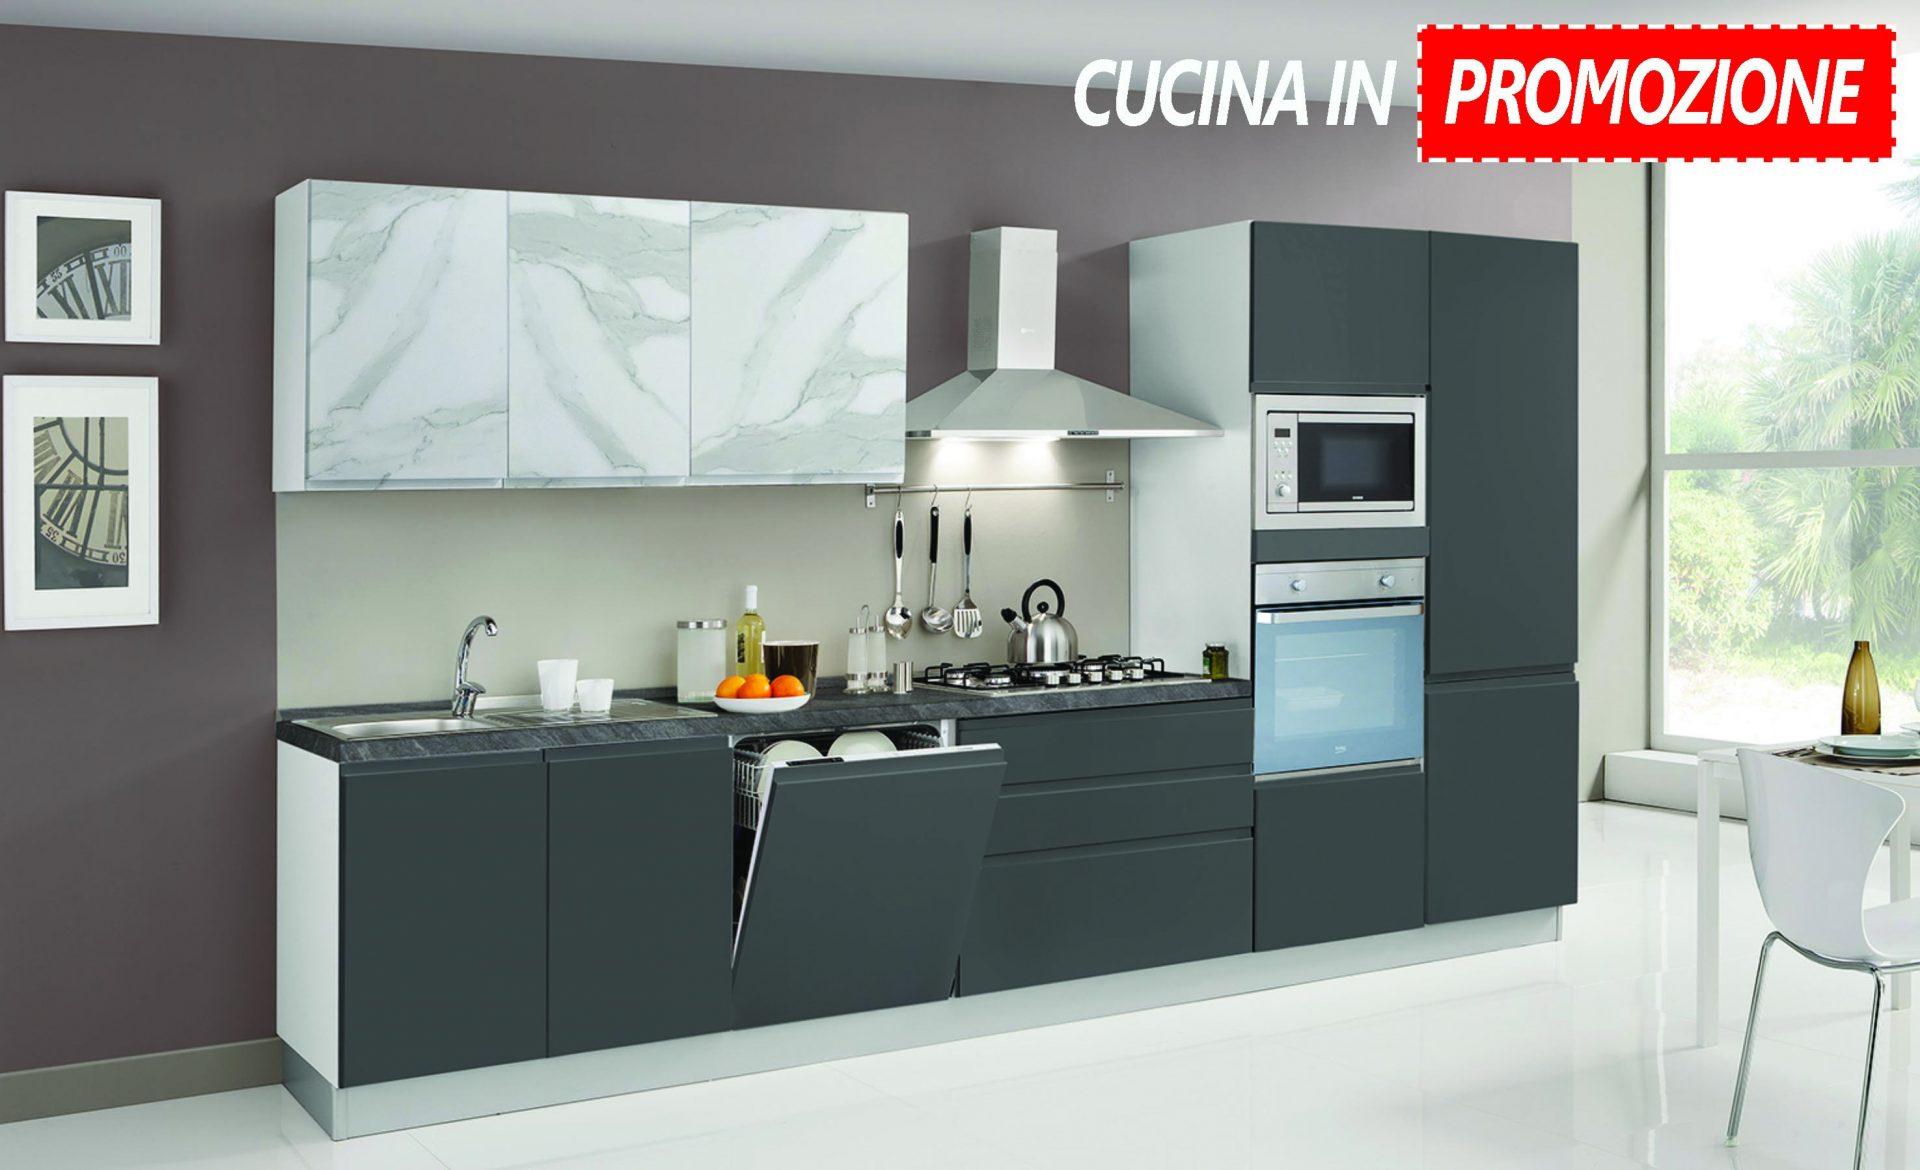 CUCINA 4 PROMO